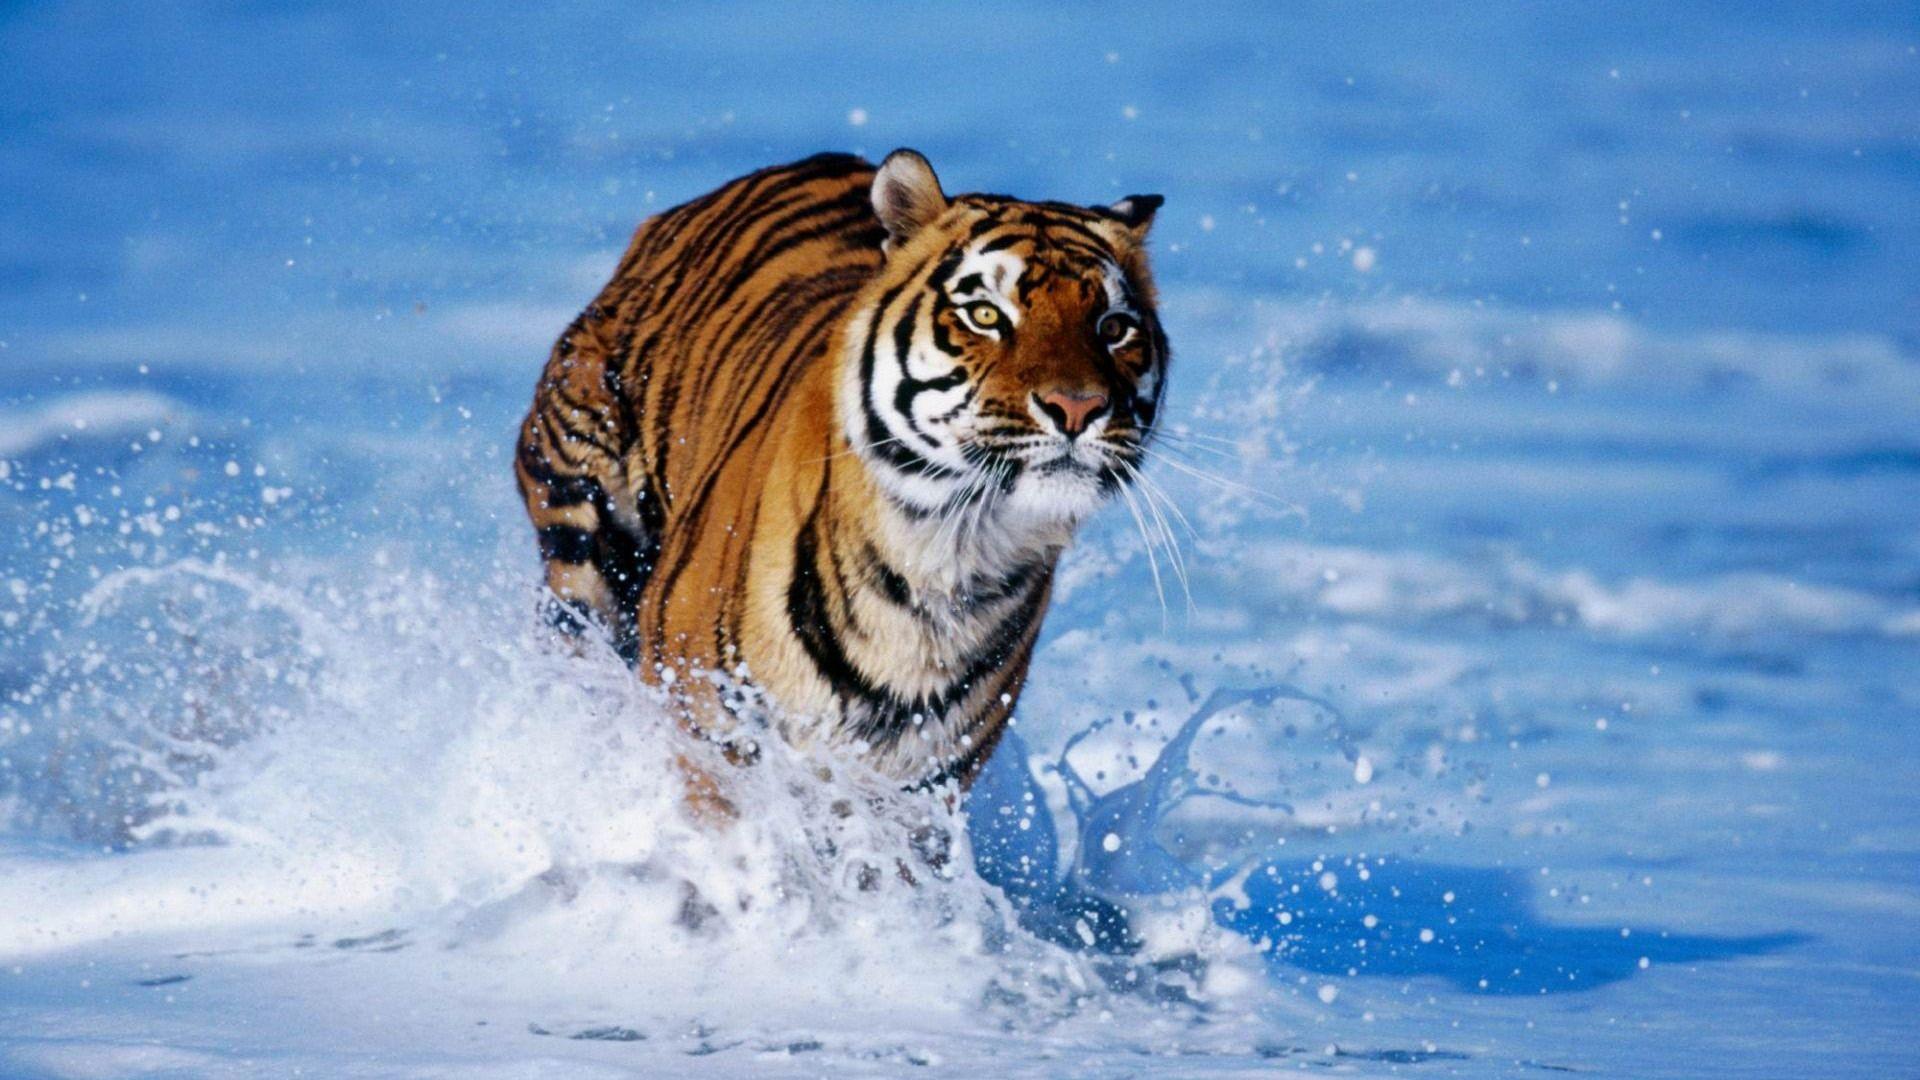 Wild Animal Hd Wallpaper 14799 Wallpaper Download Hd Wallpaper